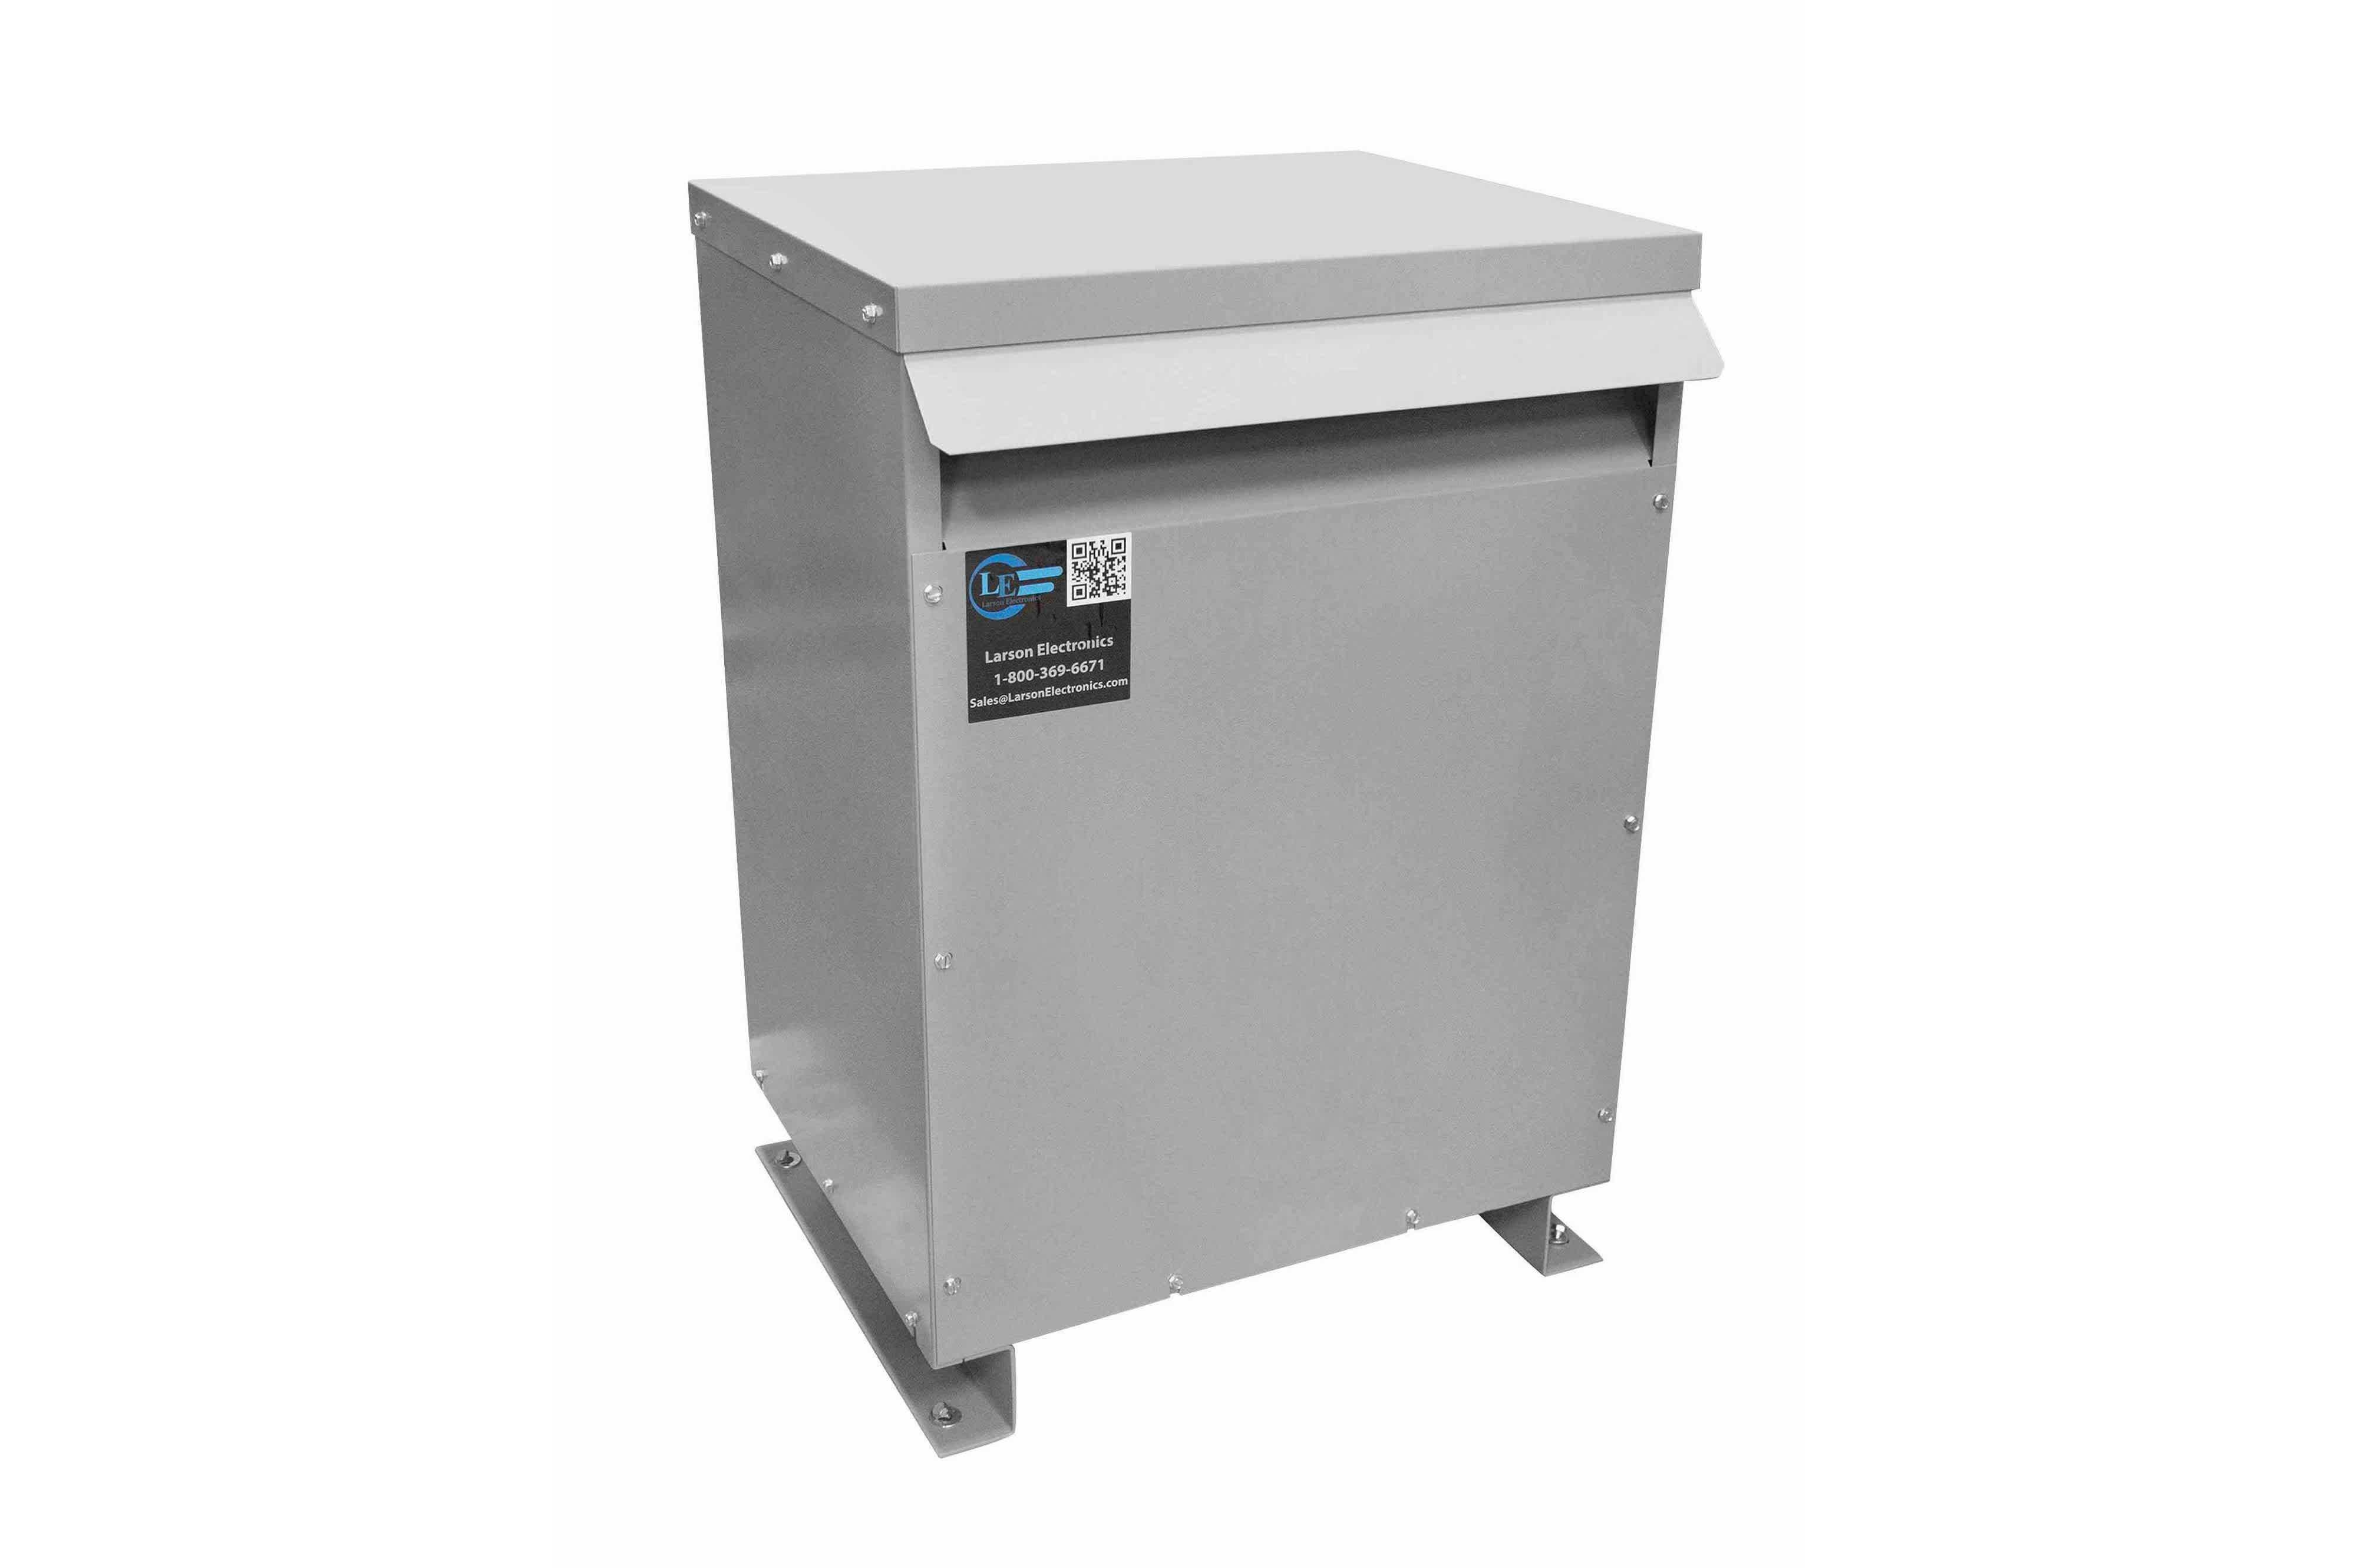 37.5 kVA 3PH Isolation Transformer, 480V Wye Primary, 380Y/220 Wye-N Secondary, N3R, Ventilated, 60 Hz